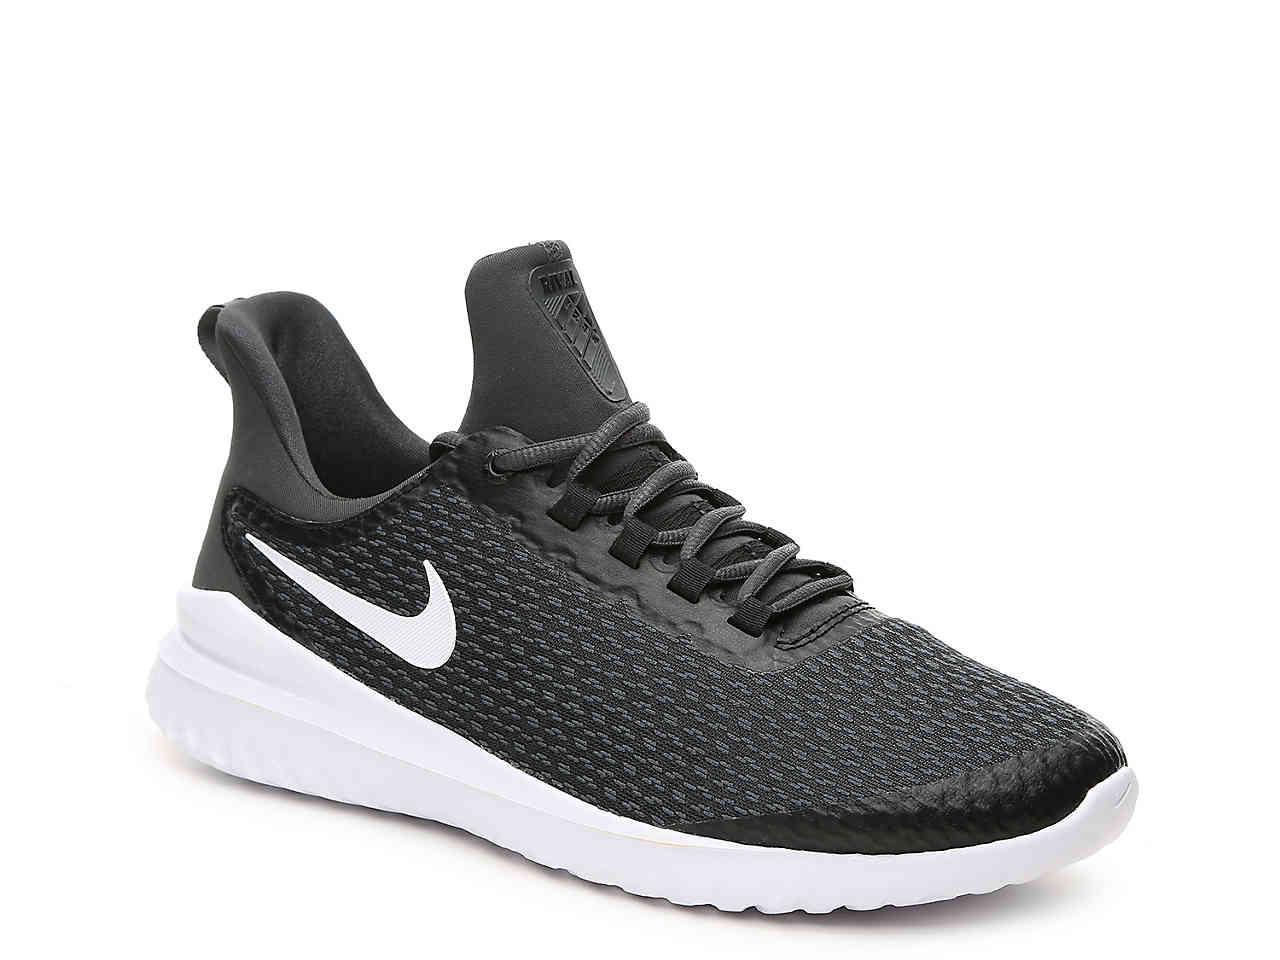 Lyst - Nike Renew Rival Lightweight Running Shoe in Black for Men ... bff99d60c